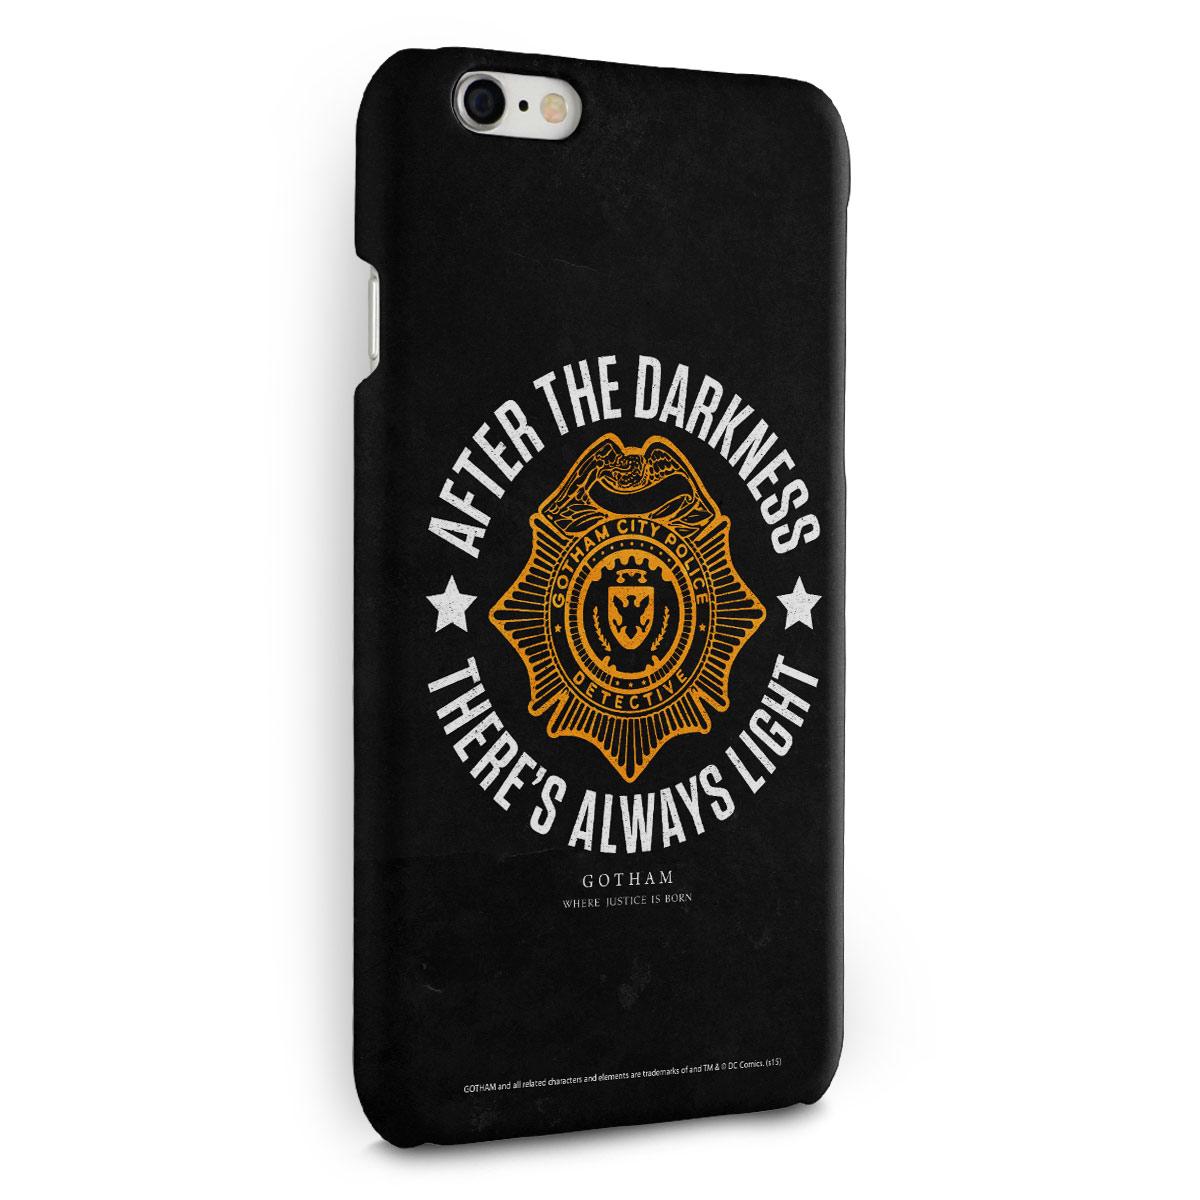 Capa para iPhone 6/6S Plus Gotham There�s Always Light